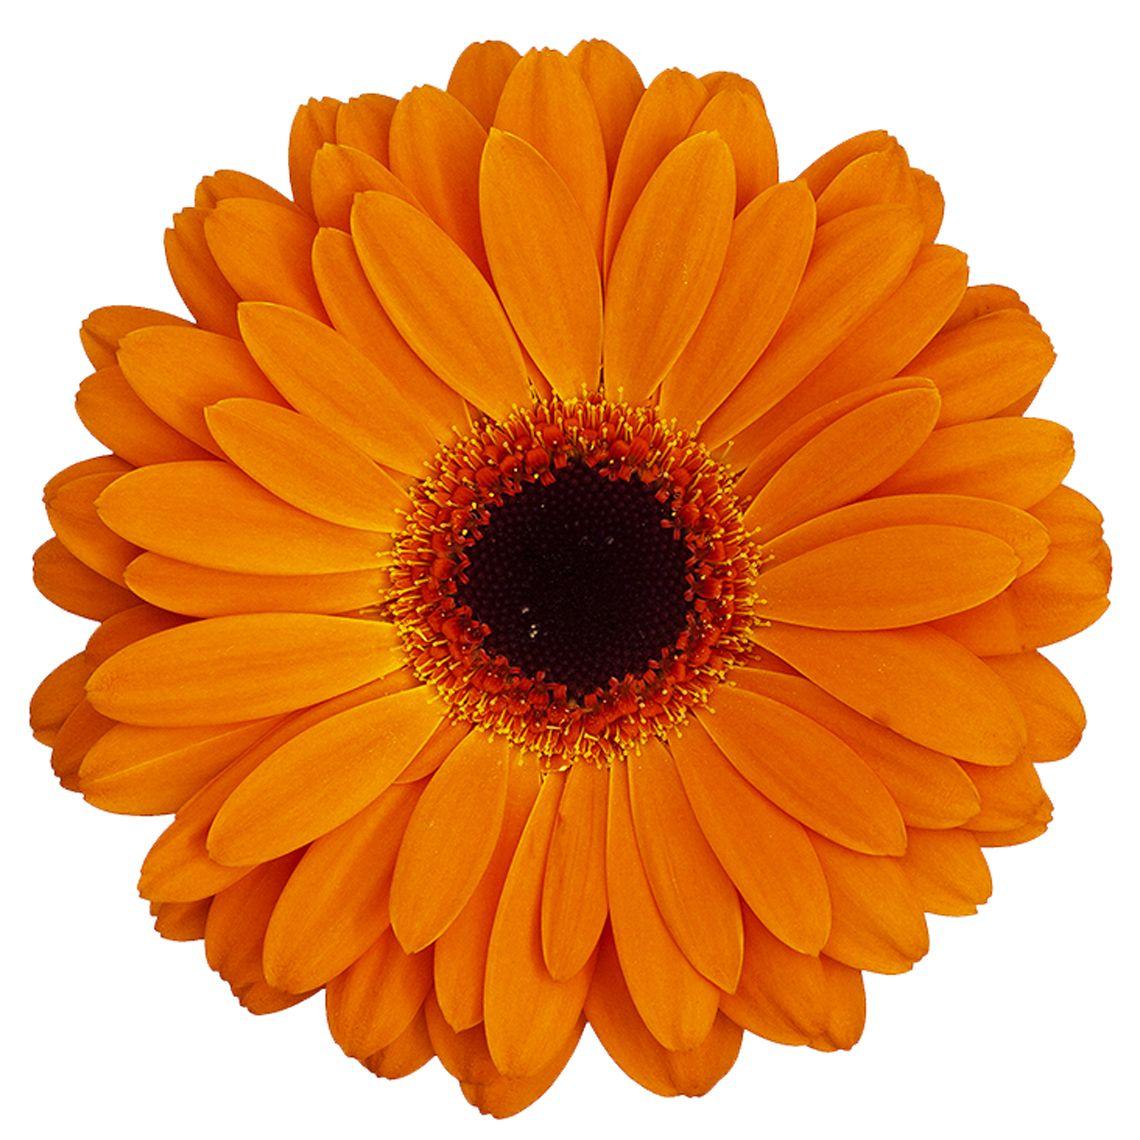 Dutch Pride Variety Standard Gerbera From Hollandia Greenhouse Http Www Hollandia Ca Album Standardgerbera Dut Gerbera Orange Wedding Flowers Gerbera Flower